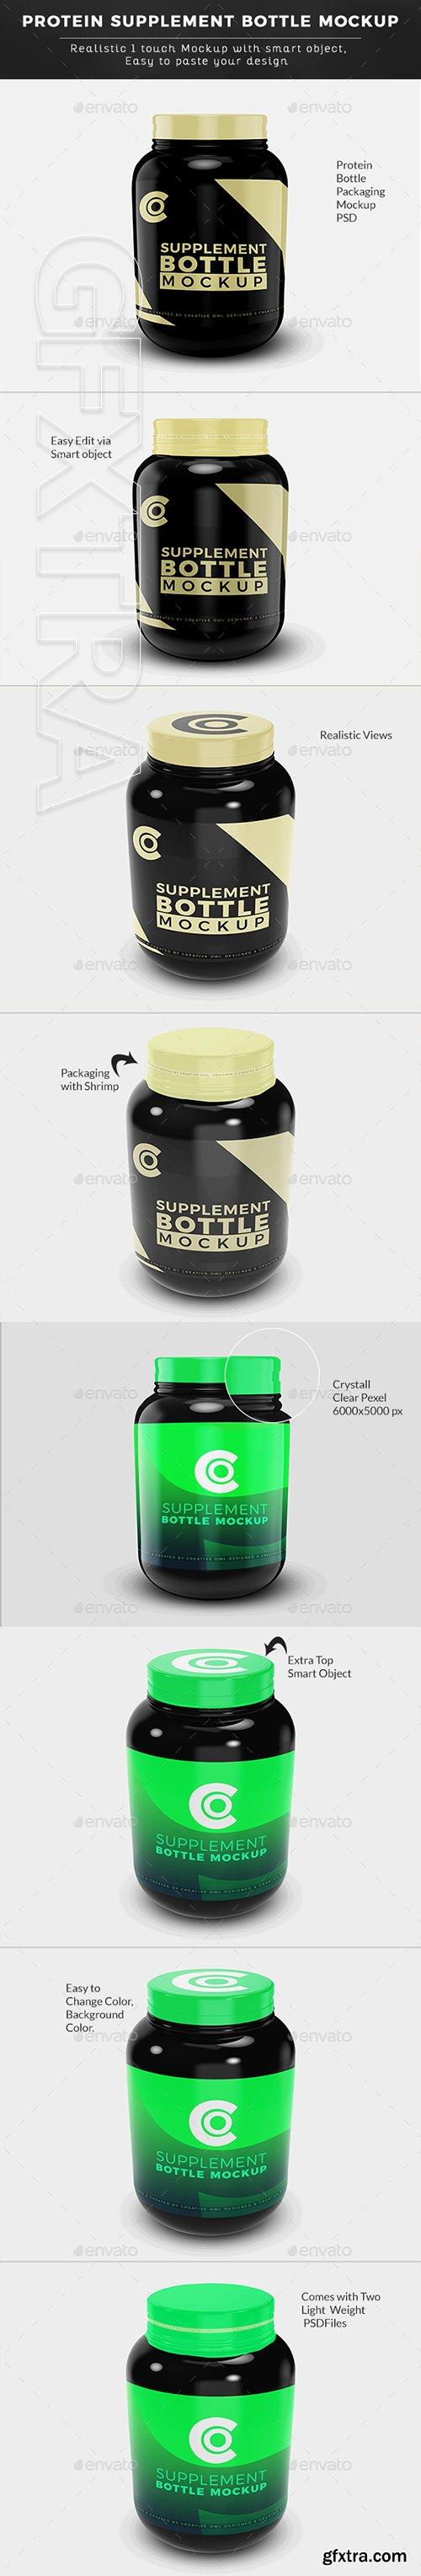 GraphicRiver - Protein Supplement Bottle Mockup 22710606